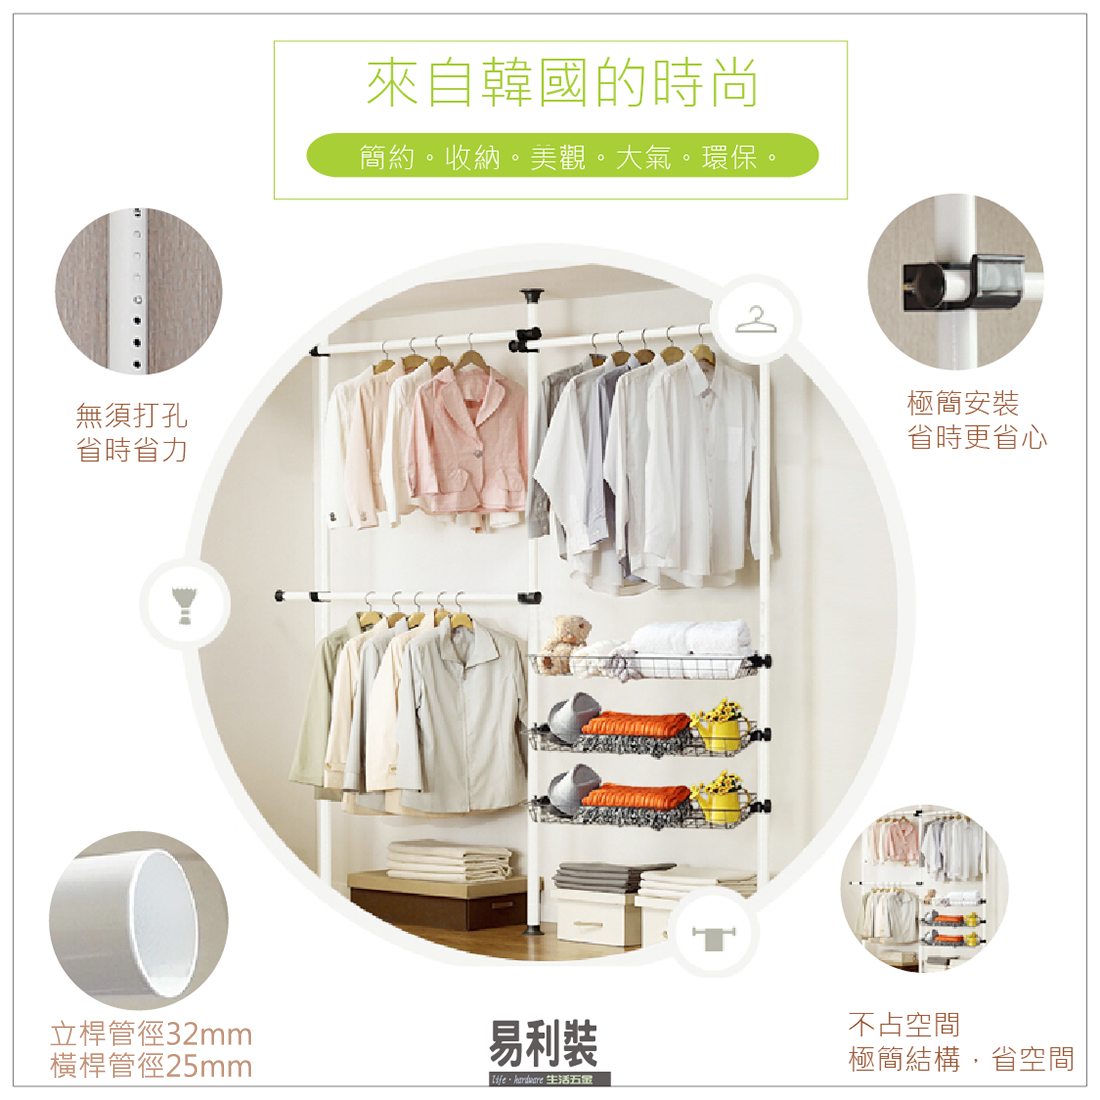 【 EASYCAN  】ECR013 頂天立地組合 易利裝生活五金 房間 臥房 衣櫃 小資族 辦公家具 系統家具 1